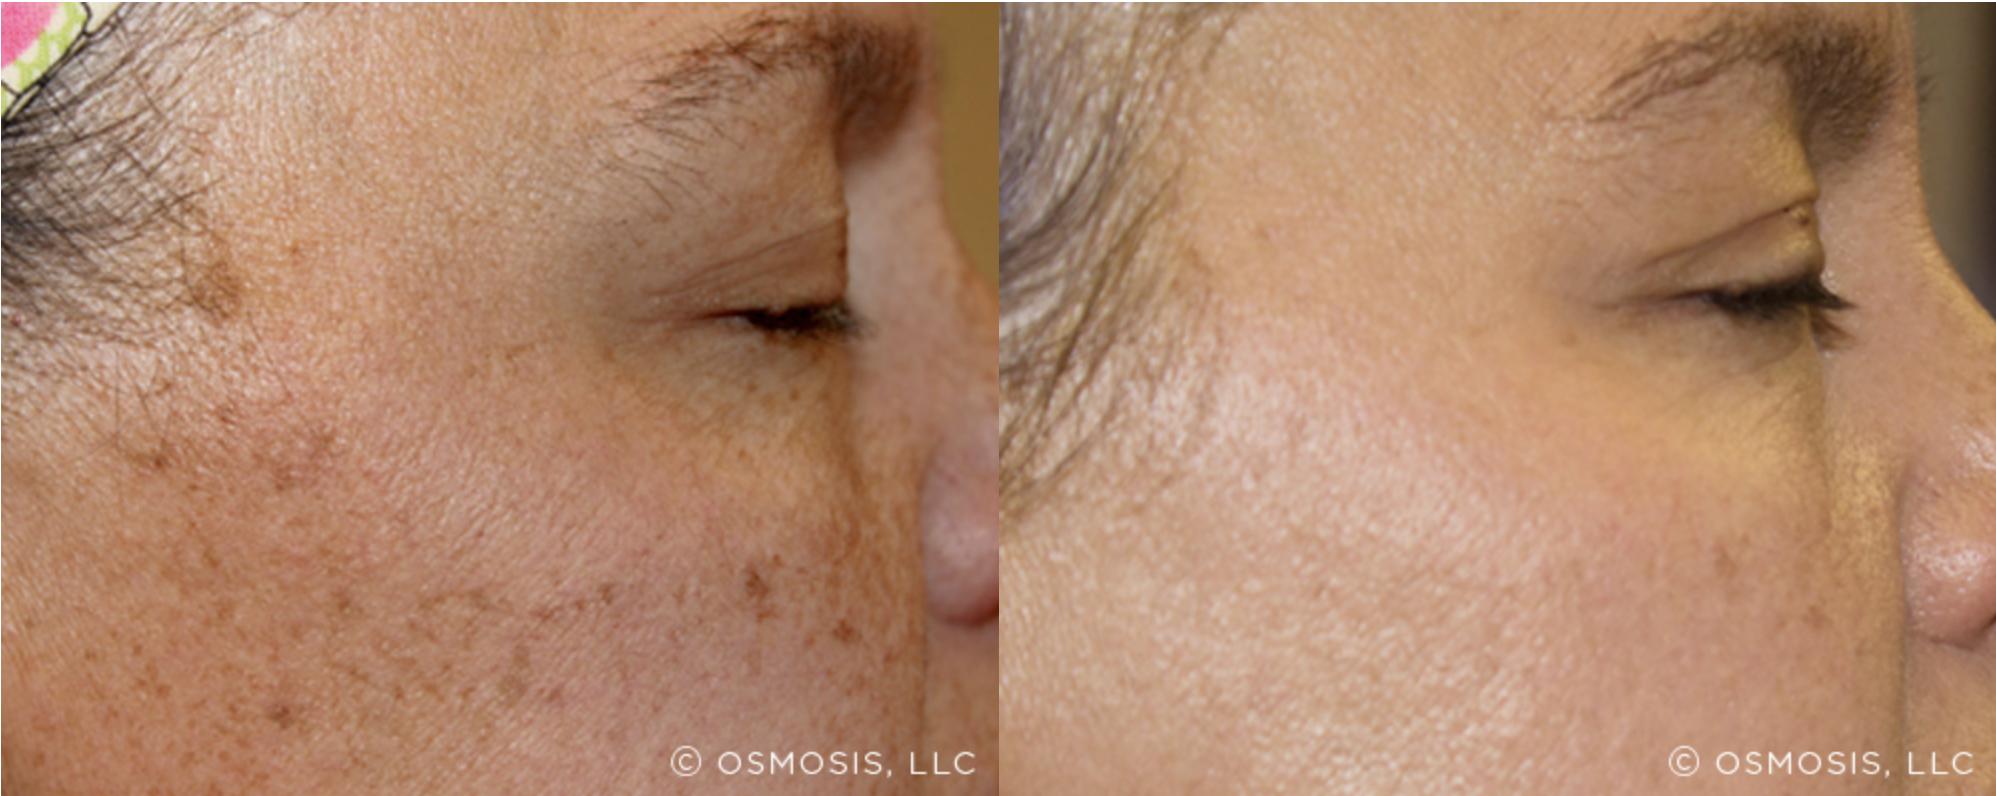 Osmosis - Pigmentation 1